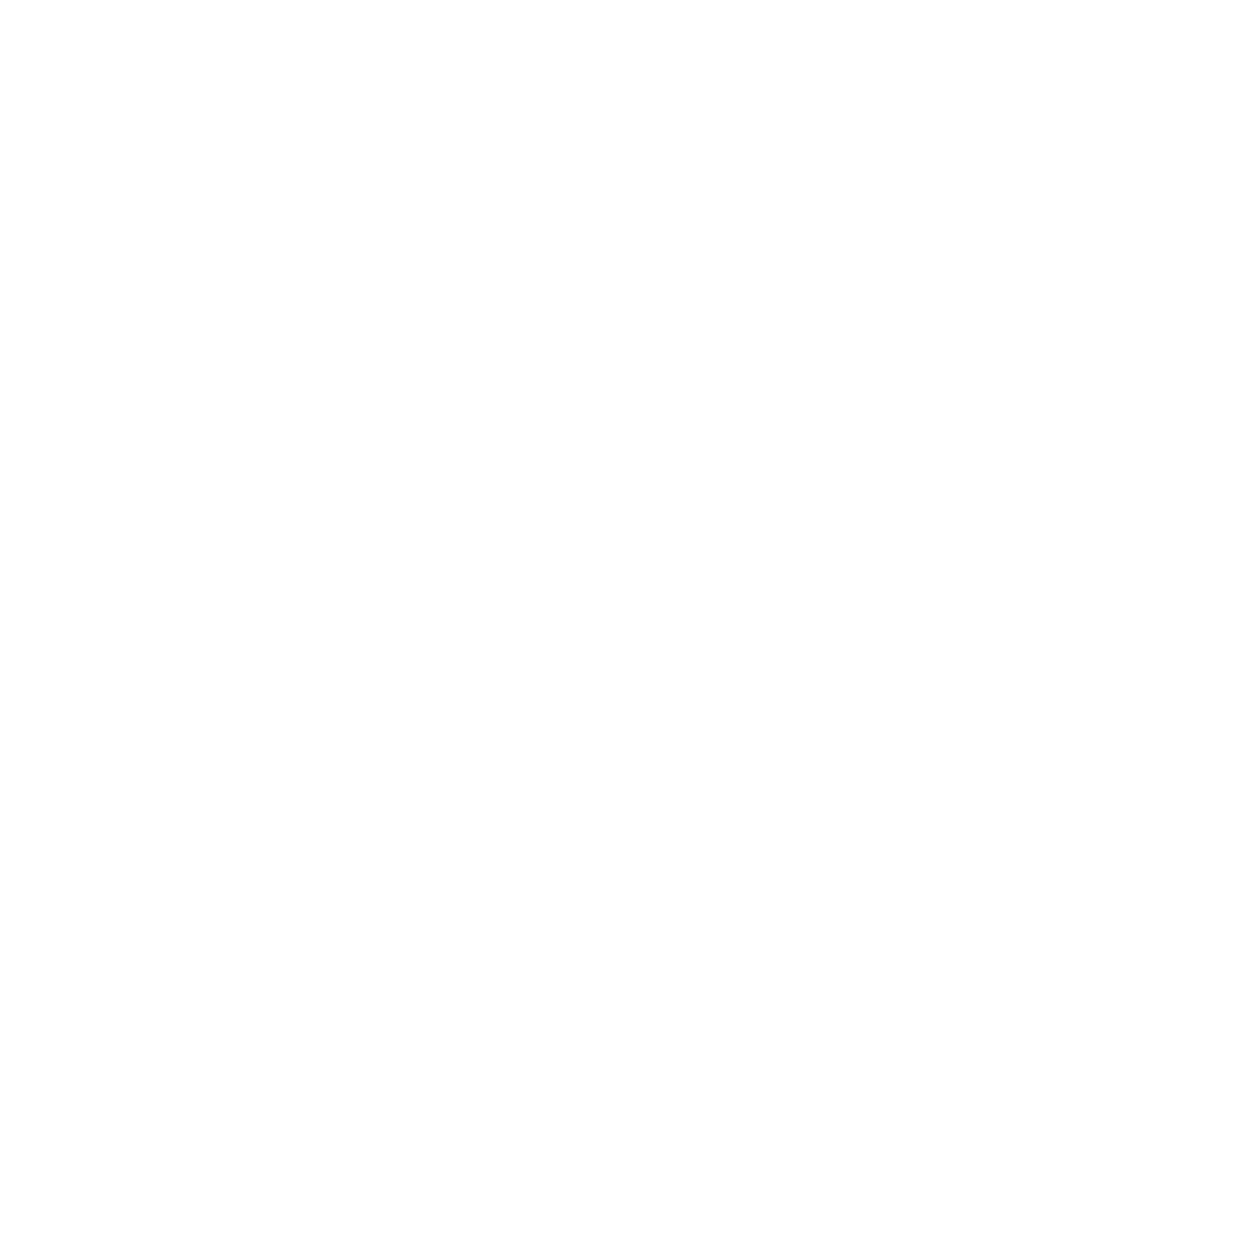 Logo png epic promise. Footprint clipart journey